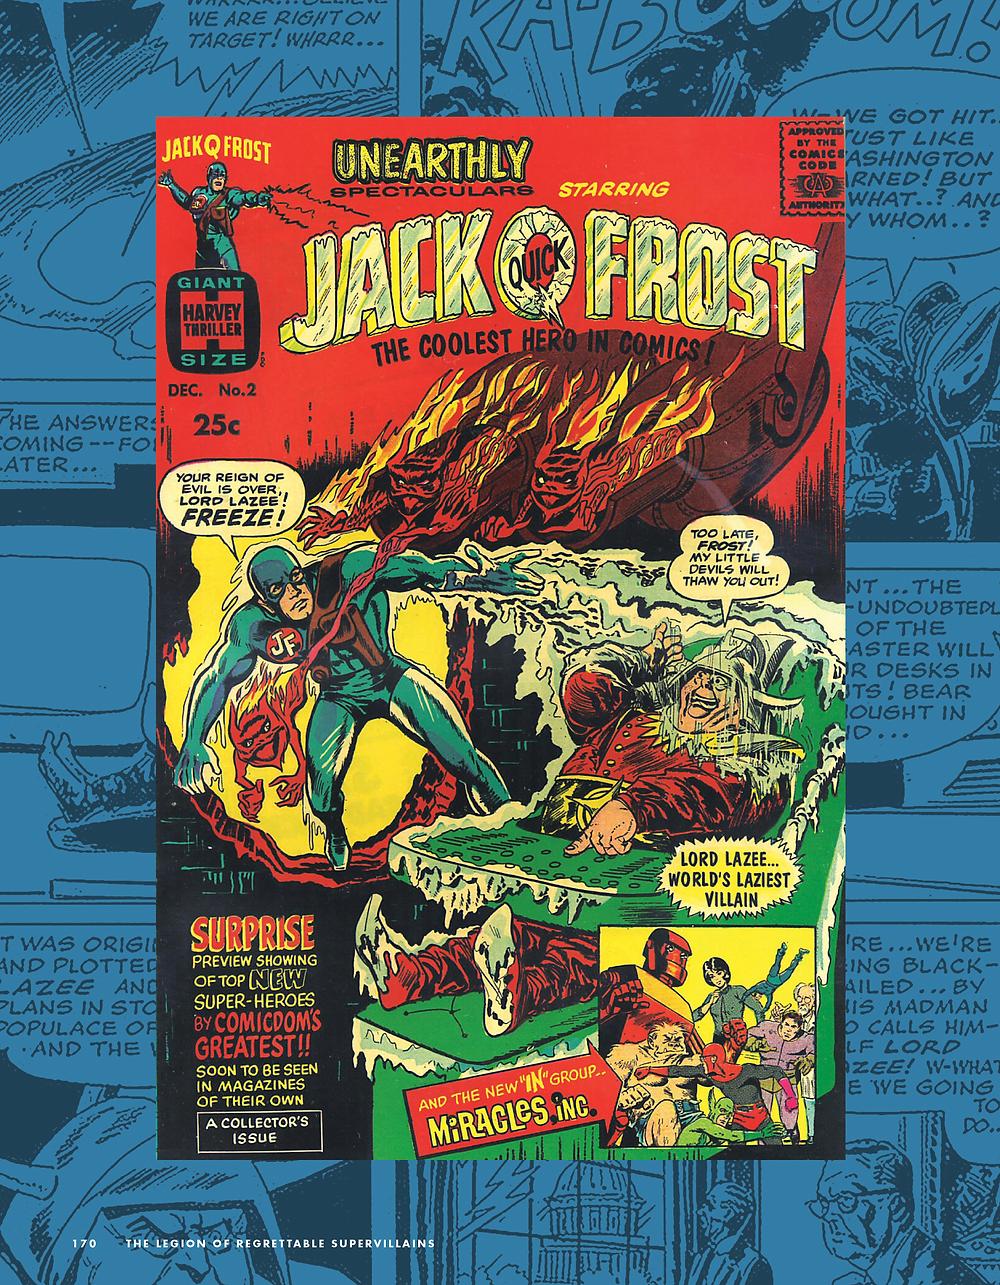 Comic Book History jack q frost